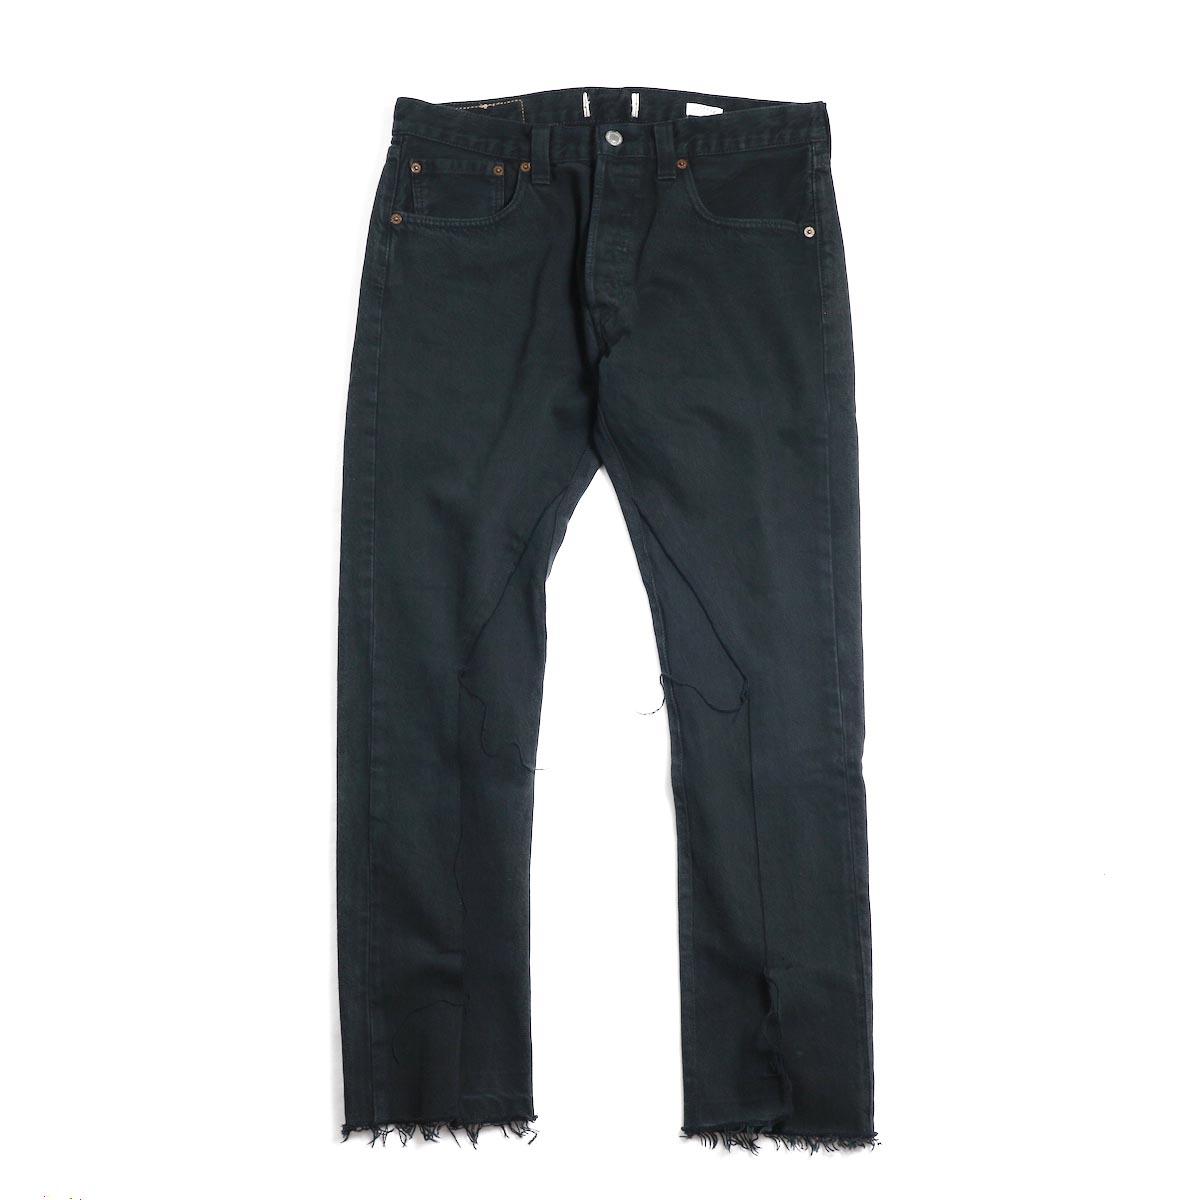 OLD PARK / Slit Jeans -Black Msize(C)